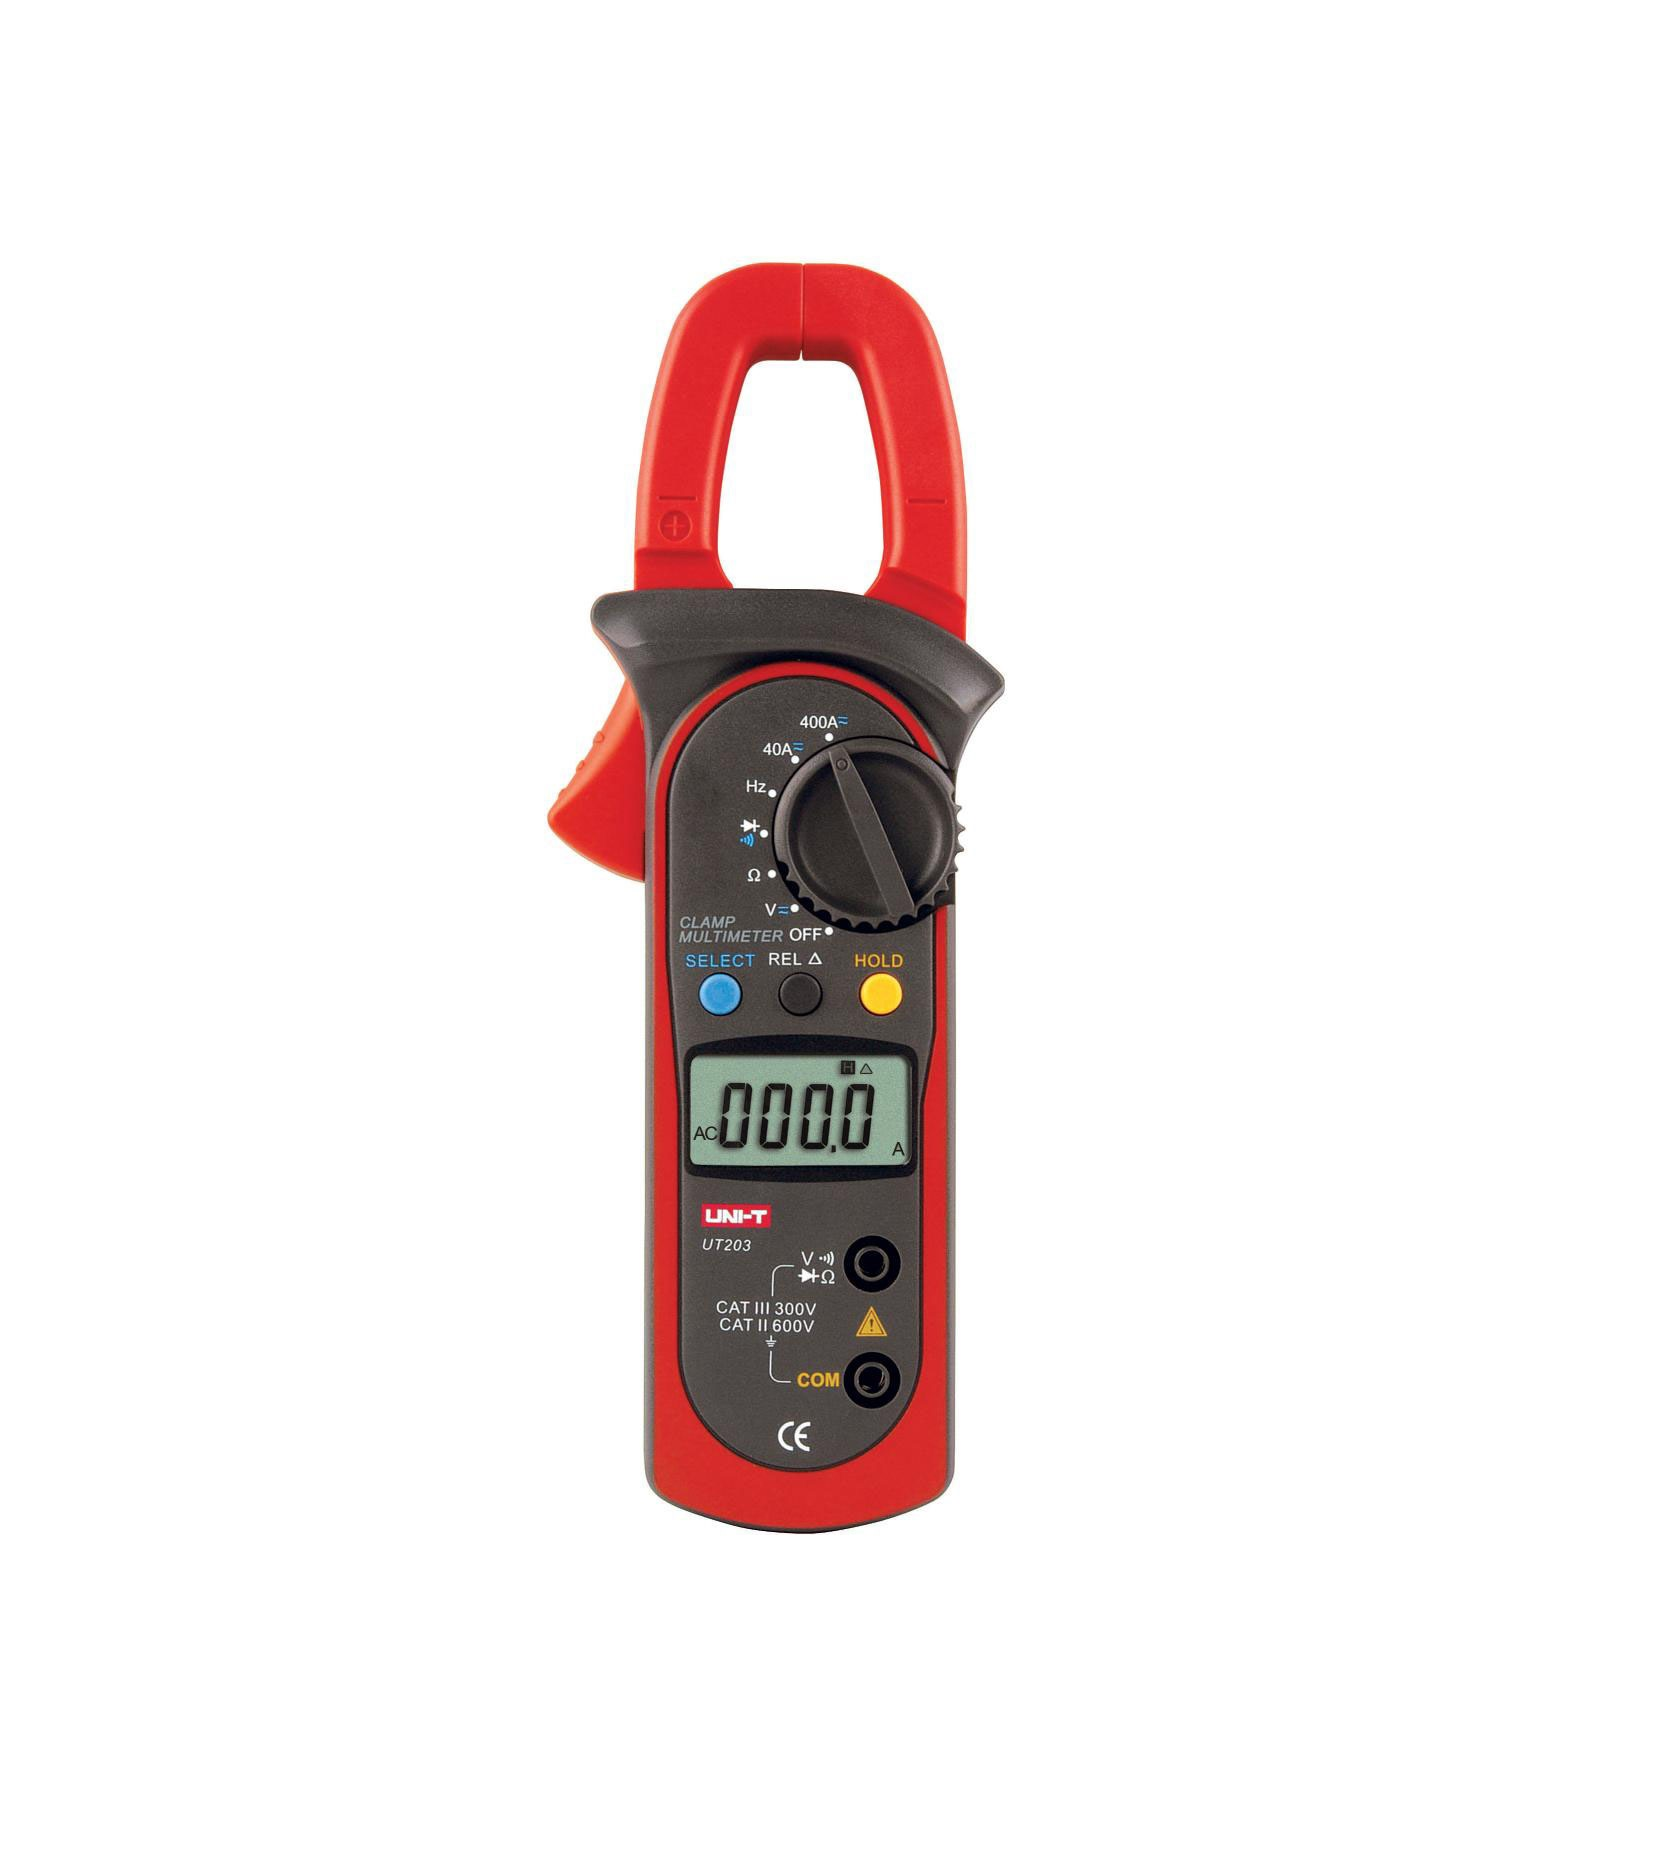 UNI-T UT203 - Digital Clamp Meters 400A; 400mV-600V